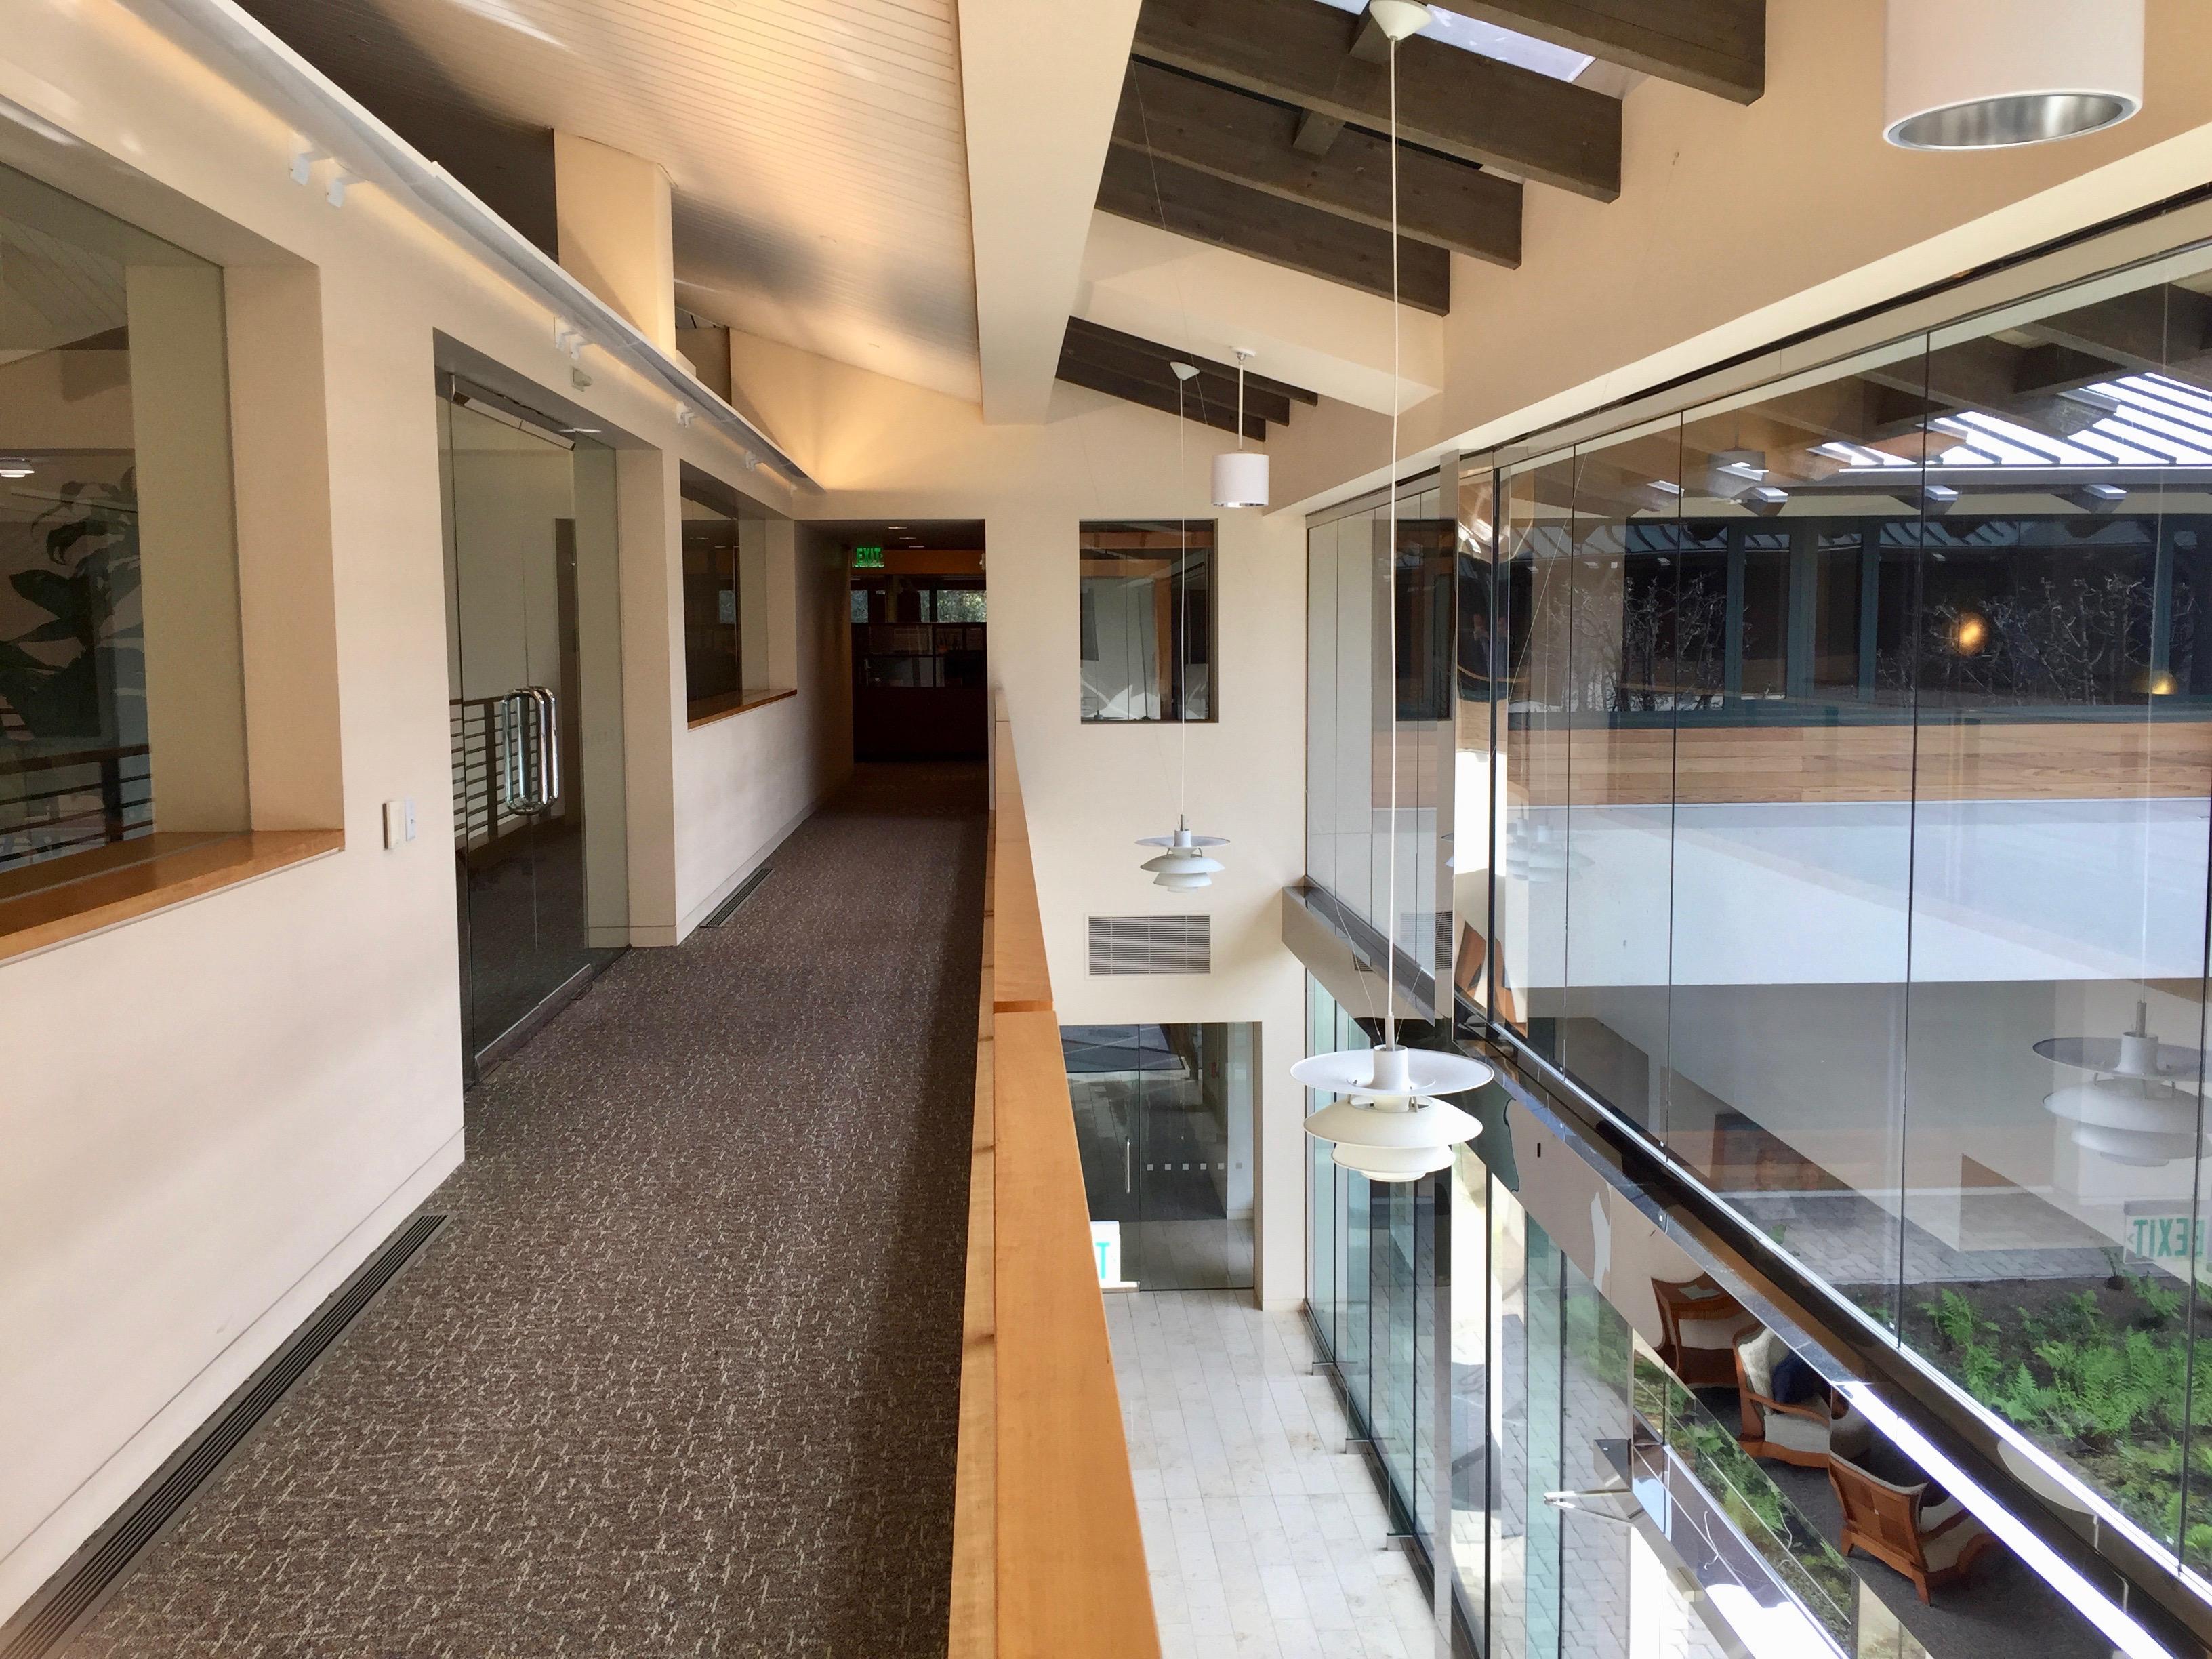 File:Hewlett Foundation office building, interior.jpg ...